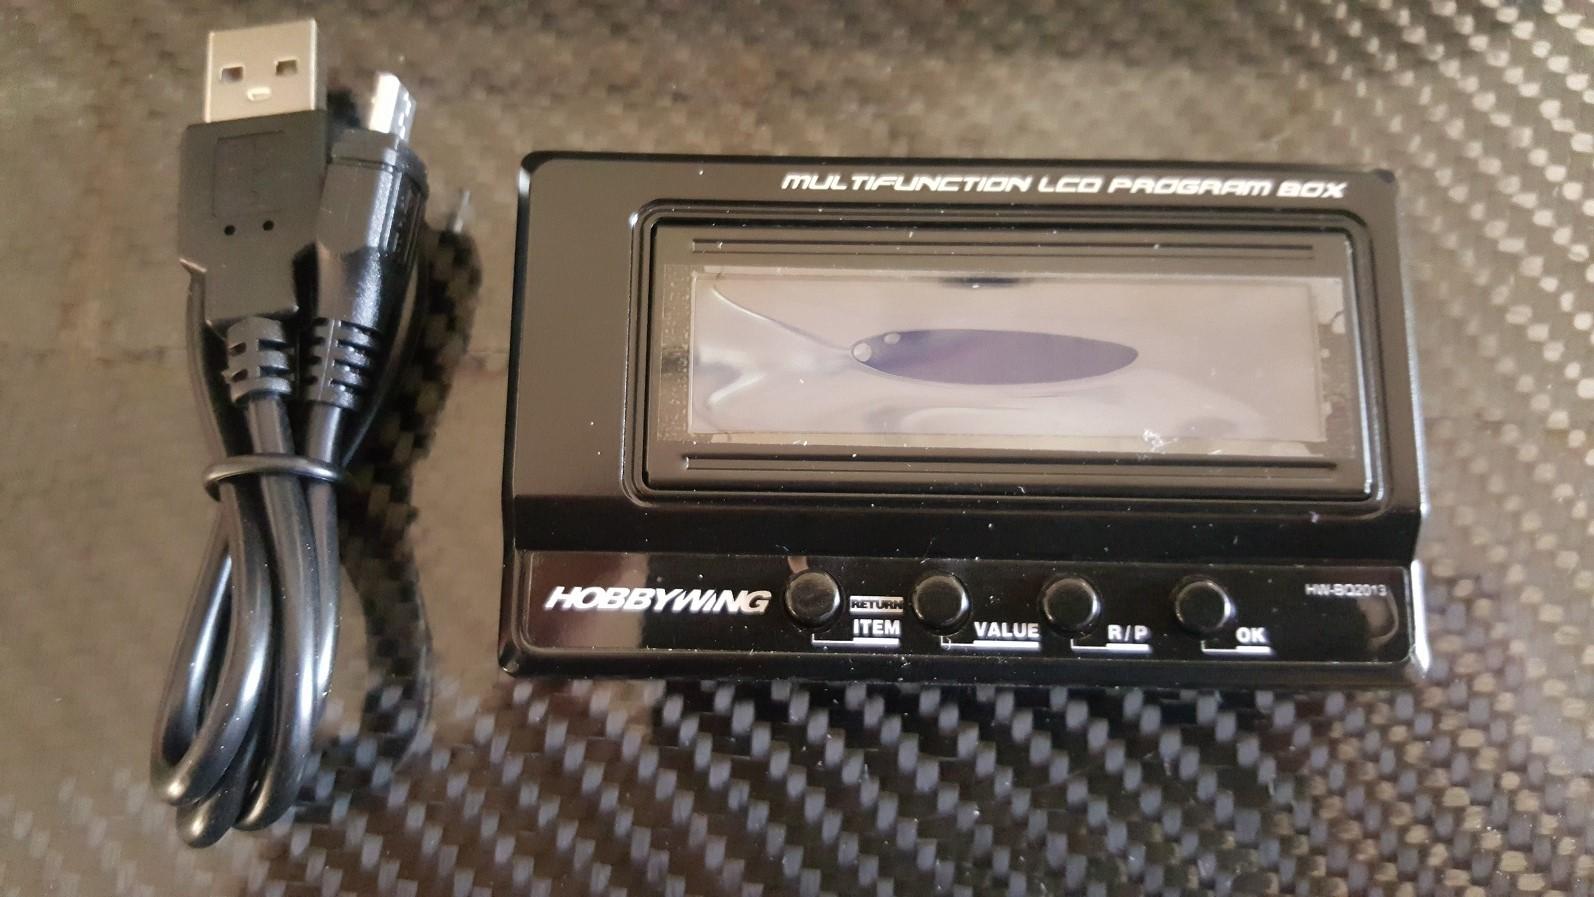 hobbywing boitier de programmation lcd multiple pour controleur batterie rc racing power boat rc. Black Bedroom Furniture Sets. Home Design Ideas